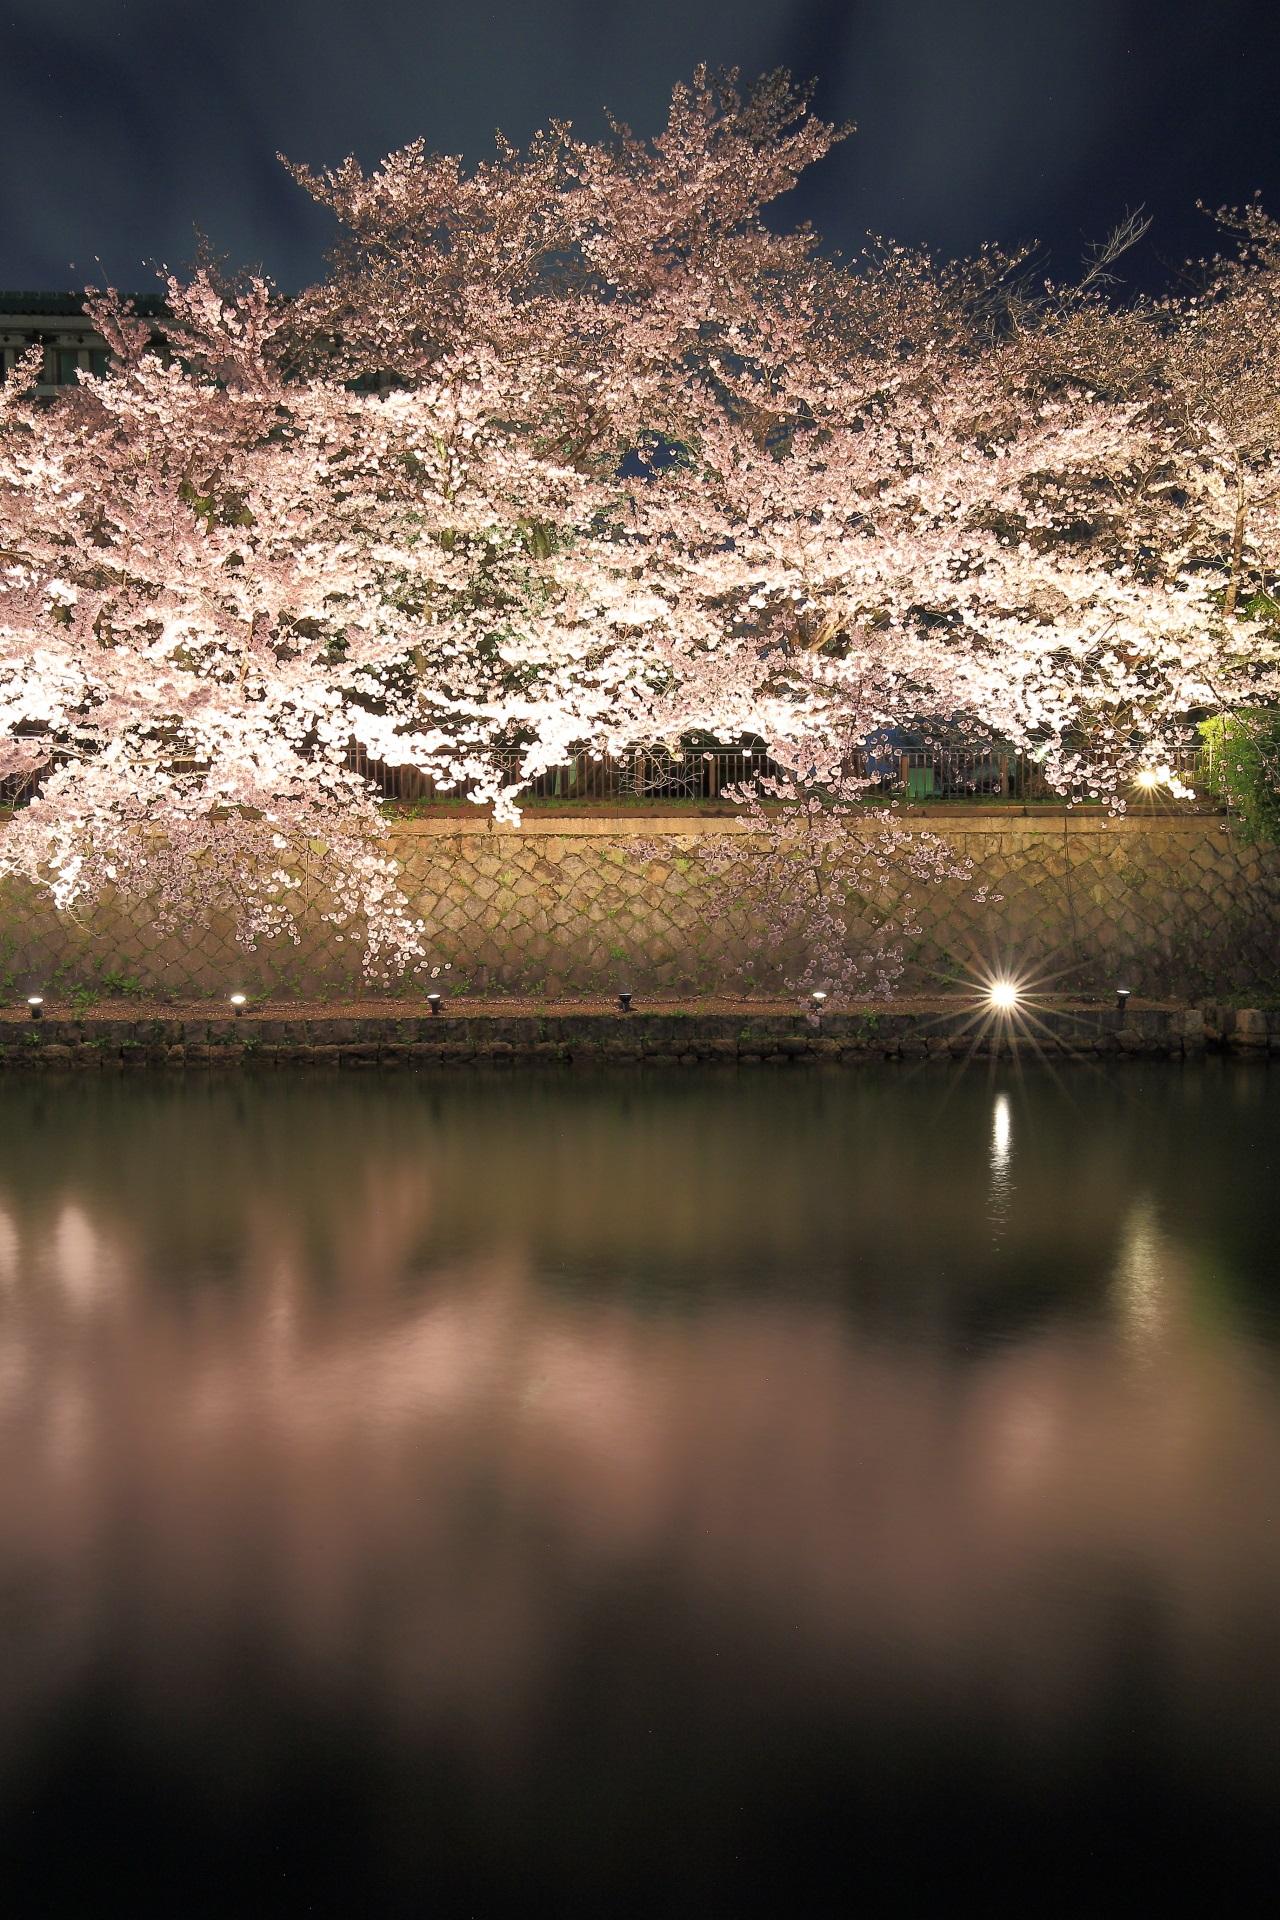 Kyoto Okazaki-sosui cherryblossoms lightup